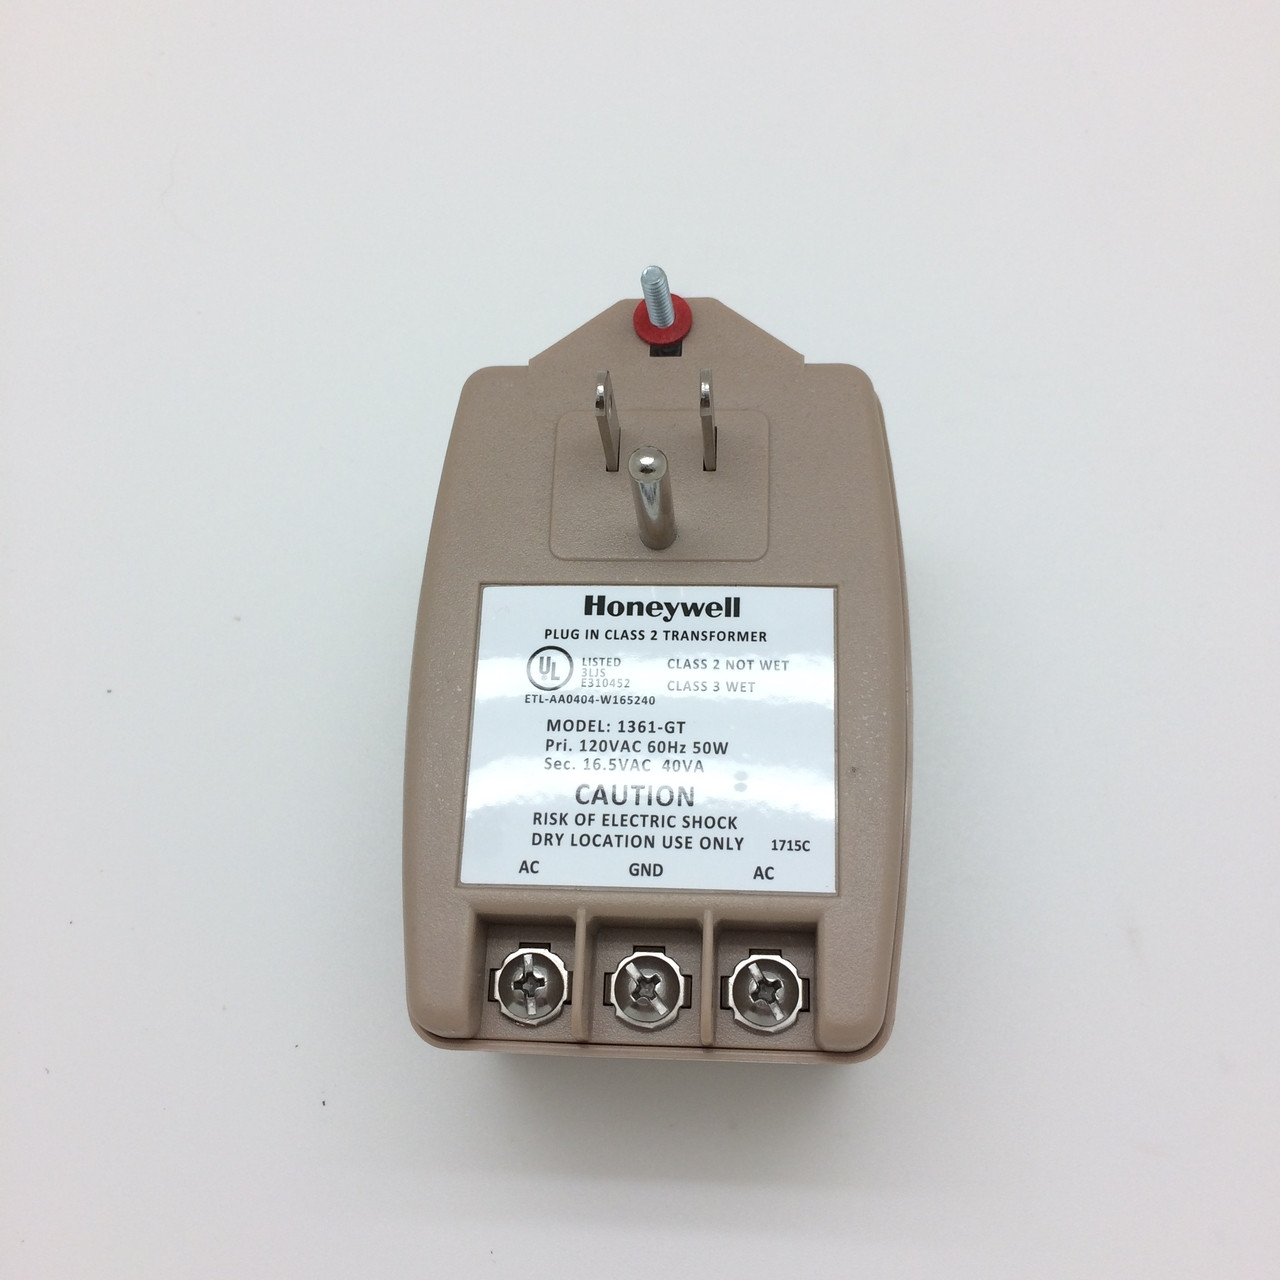 medium resolution of honeywell ademco 1361 gt transformer 16 5v 40va vista 20p control automation gt home a v distribution gt new house wiring